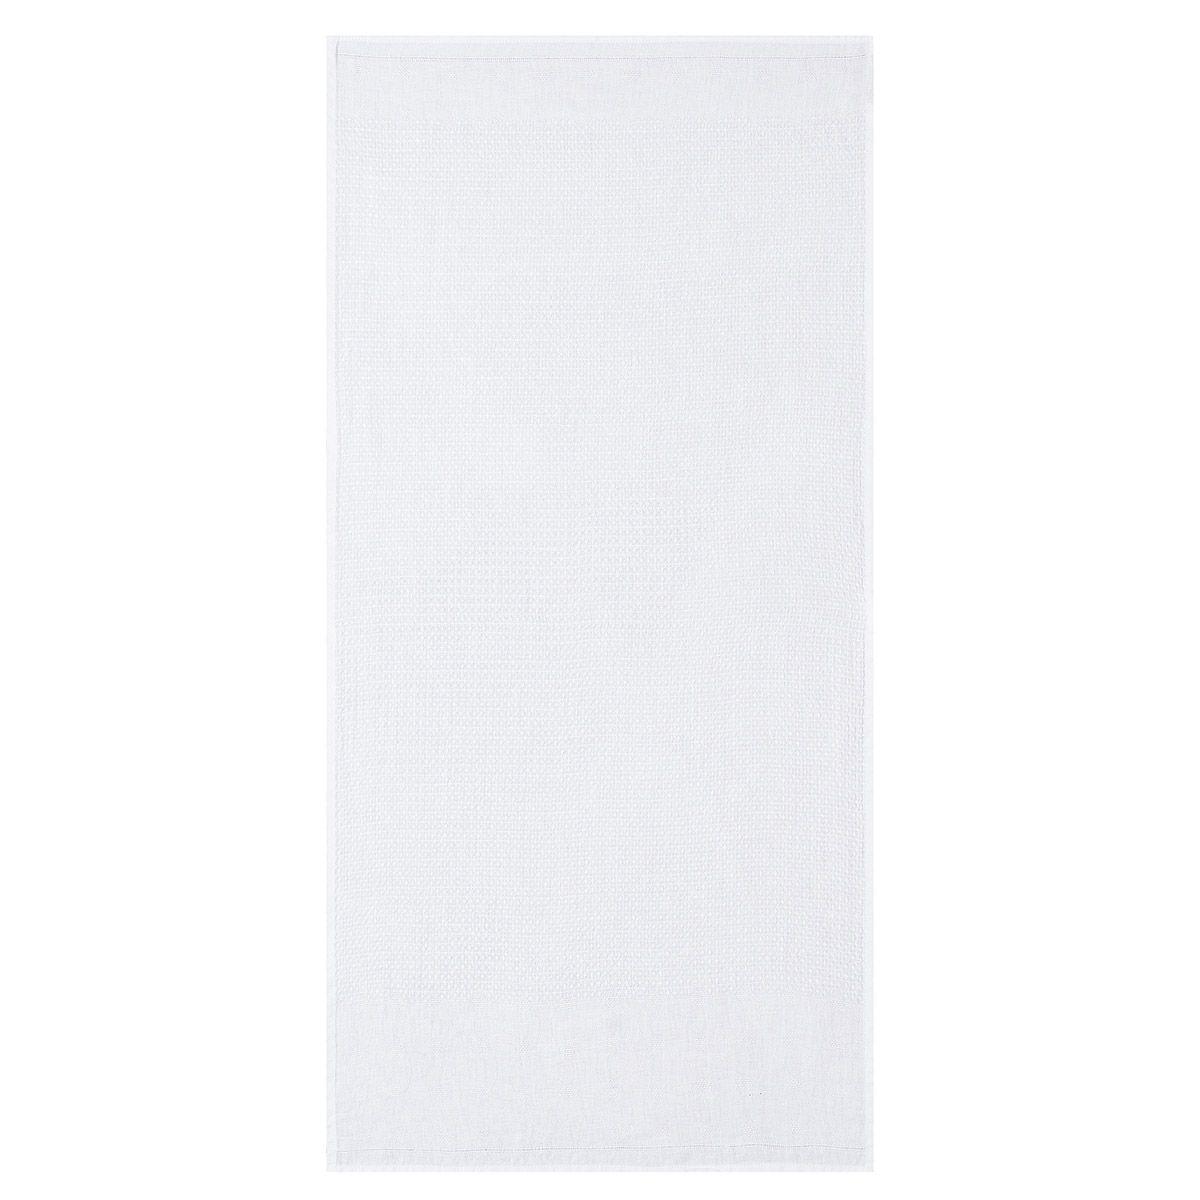 Serviette en lin blanc 30 x 50